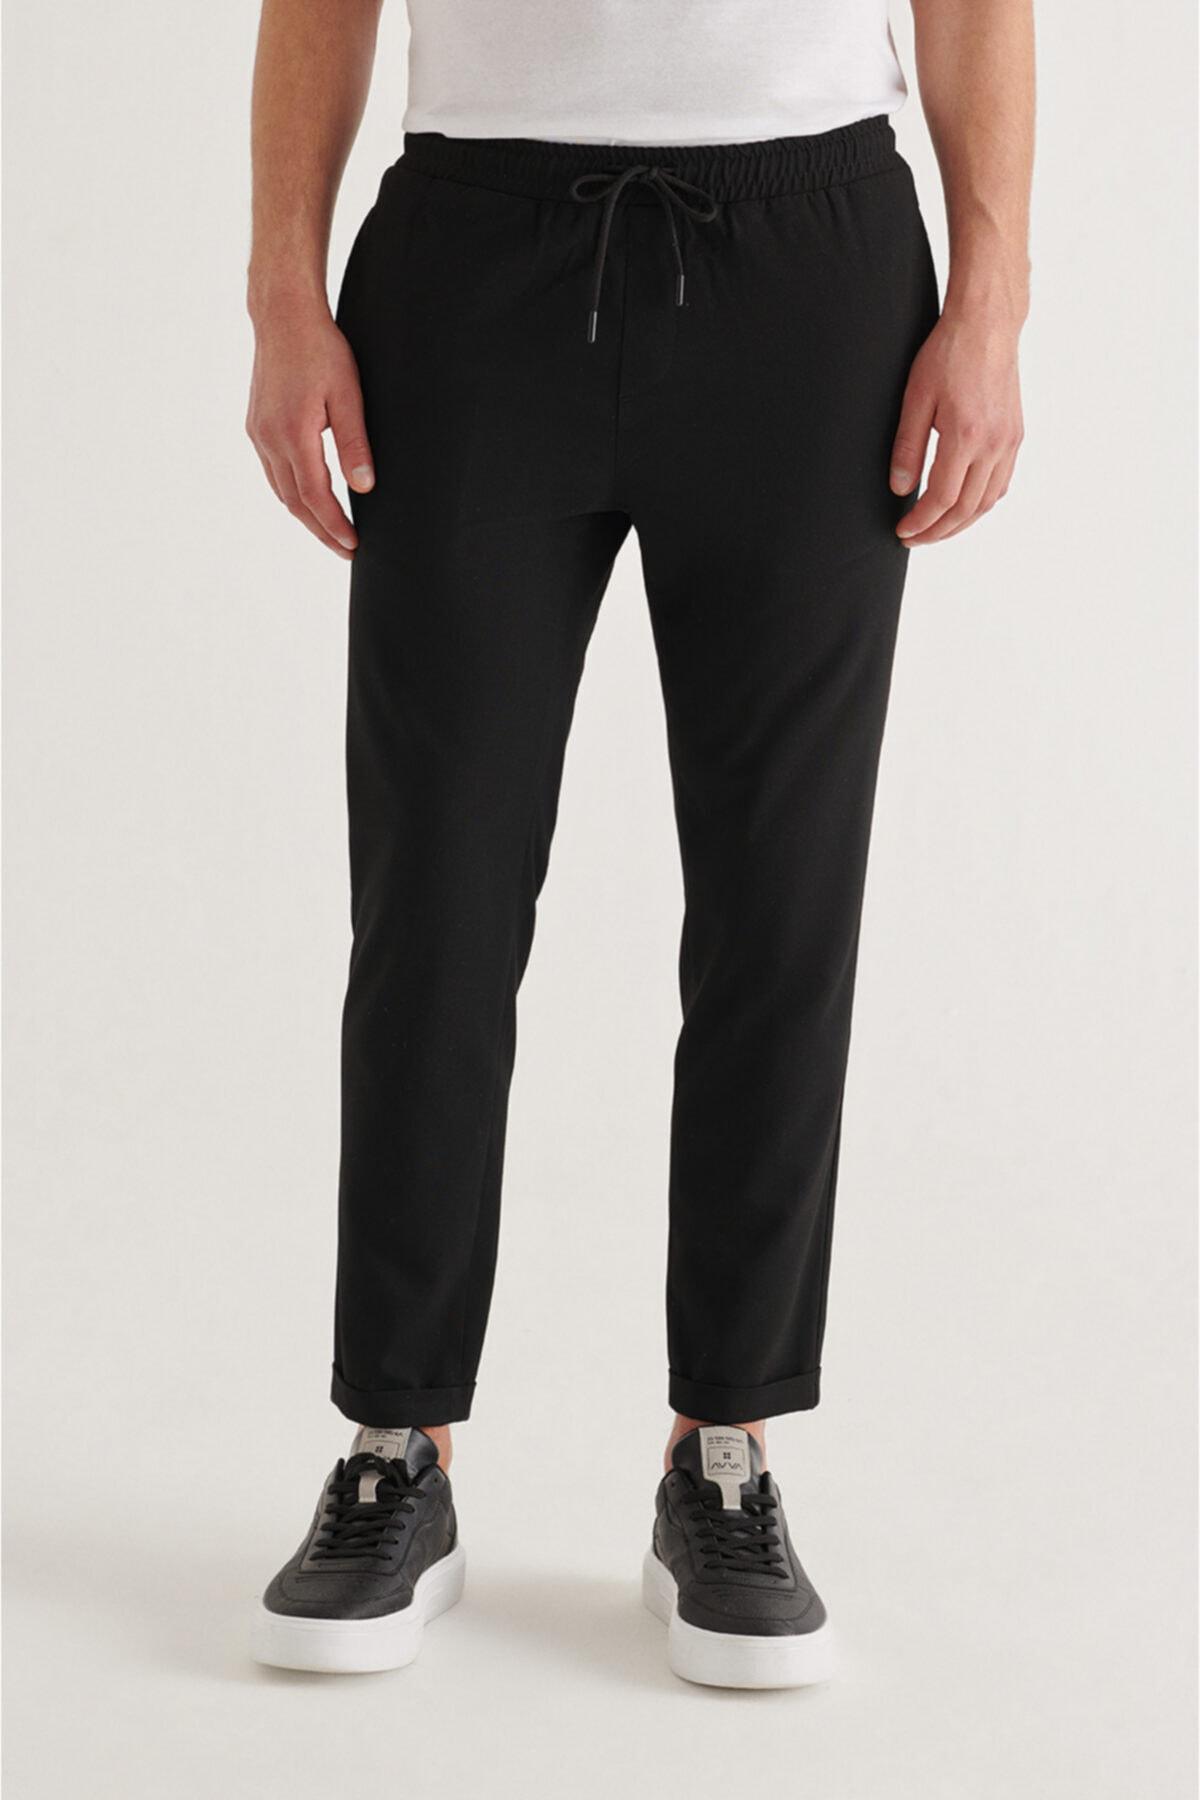 Erkek Siyah Yandan Cepli Beli Lastikli Kordonlu Düz Relaxed Fit Pantolon E003000